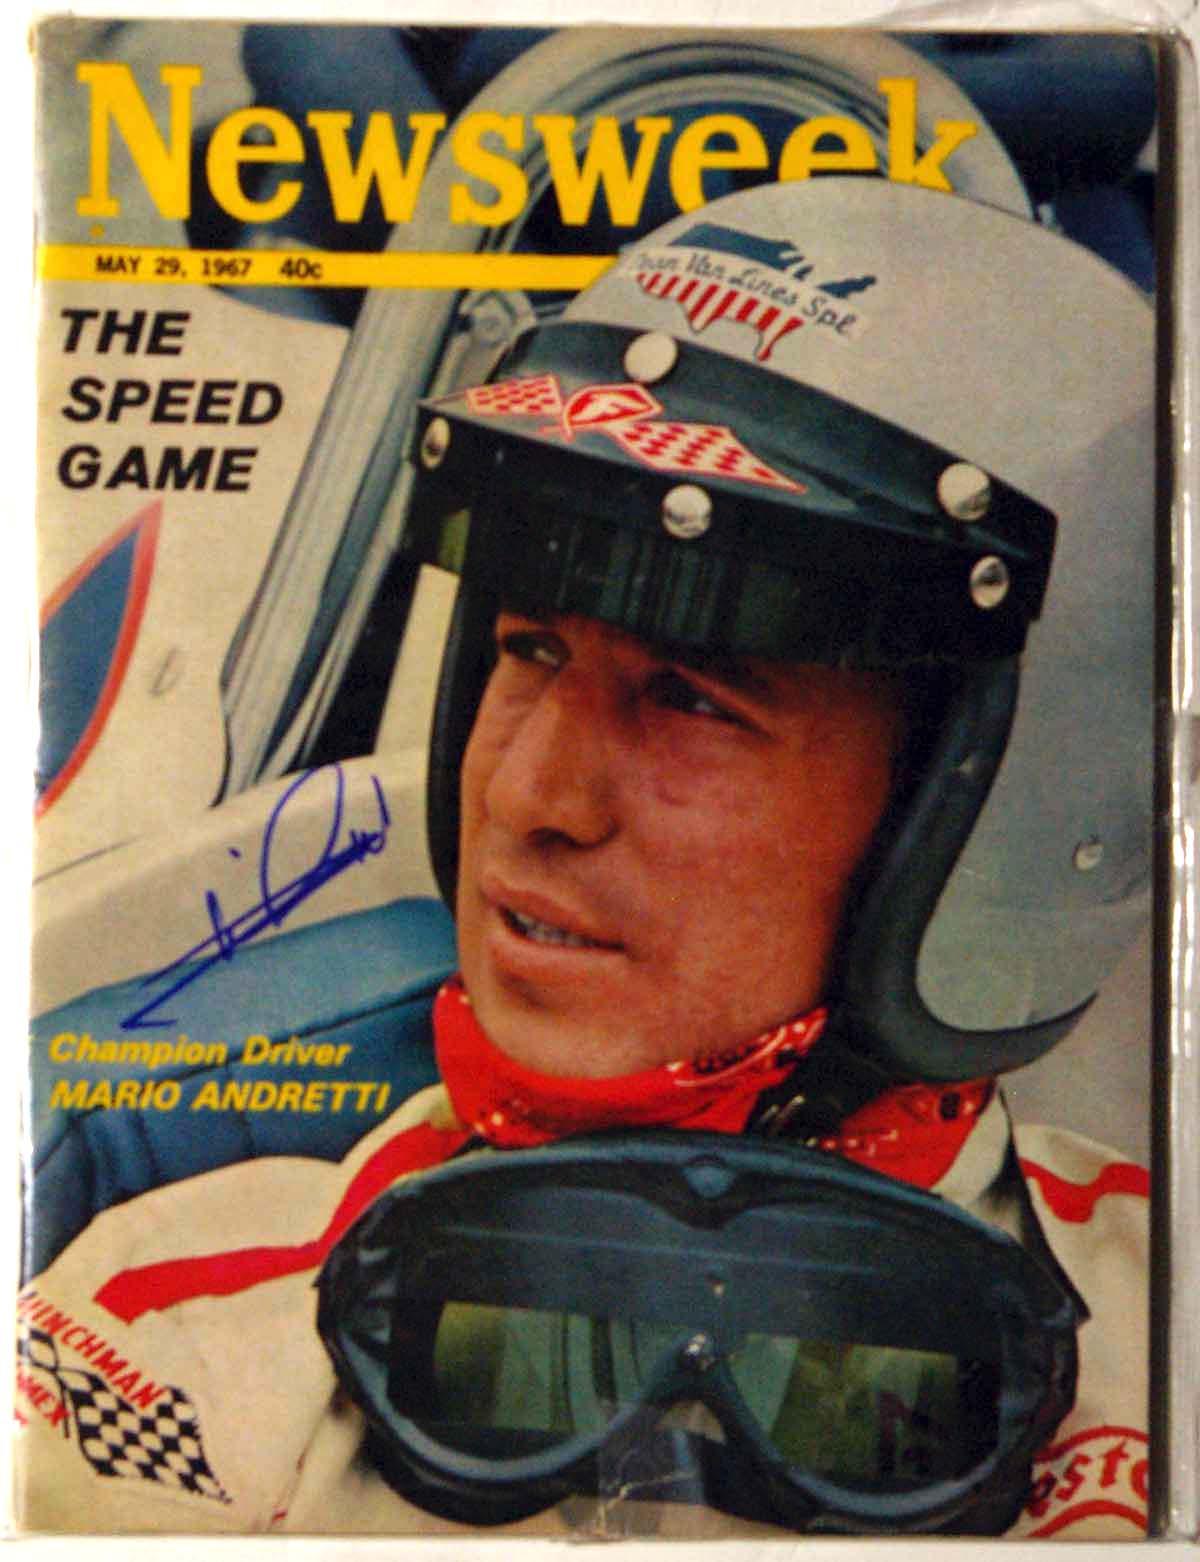 Lot #965  Program  Andretti, Mario Signed 1967 Newsweek (JSA LOA) Cond: 9.5